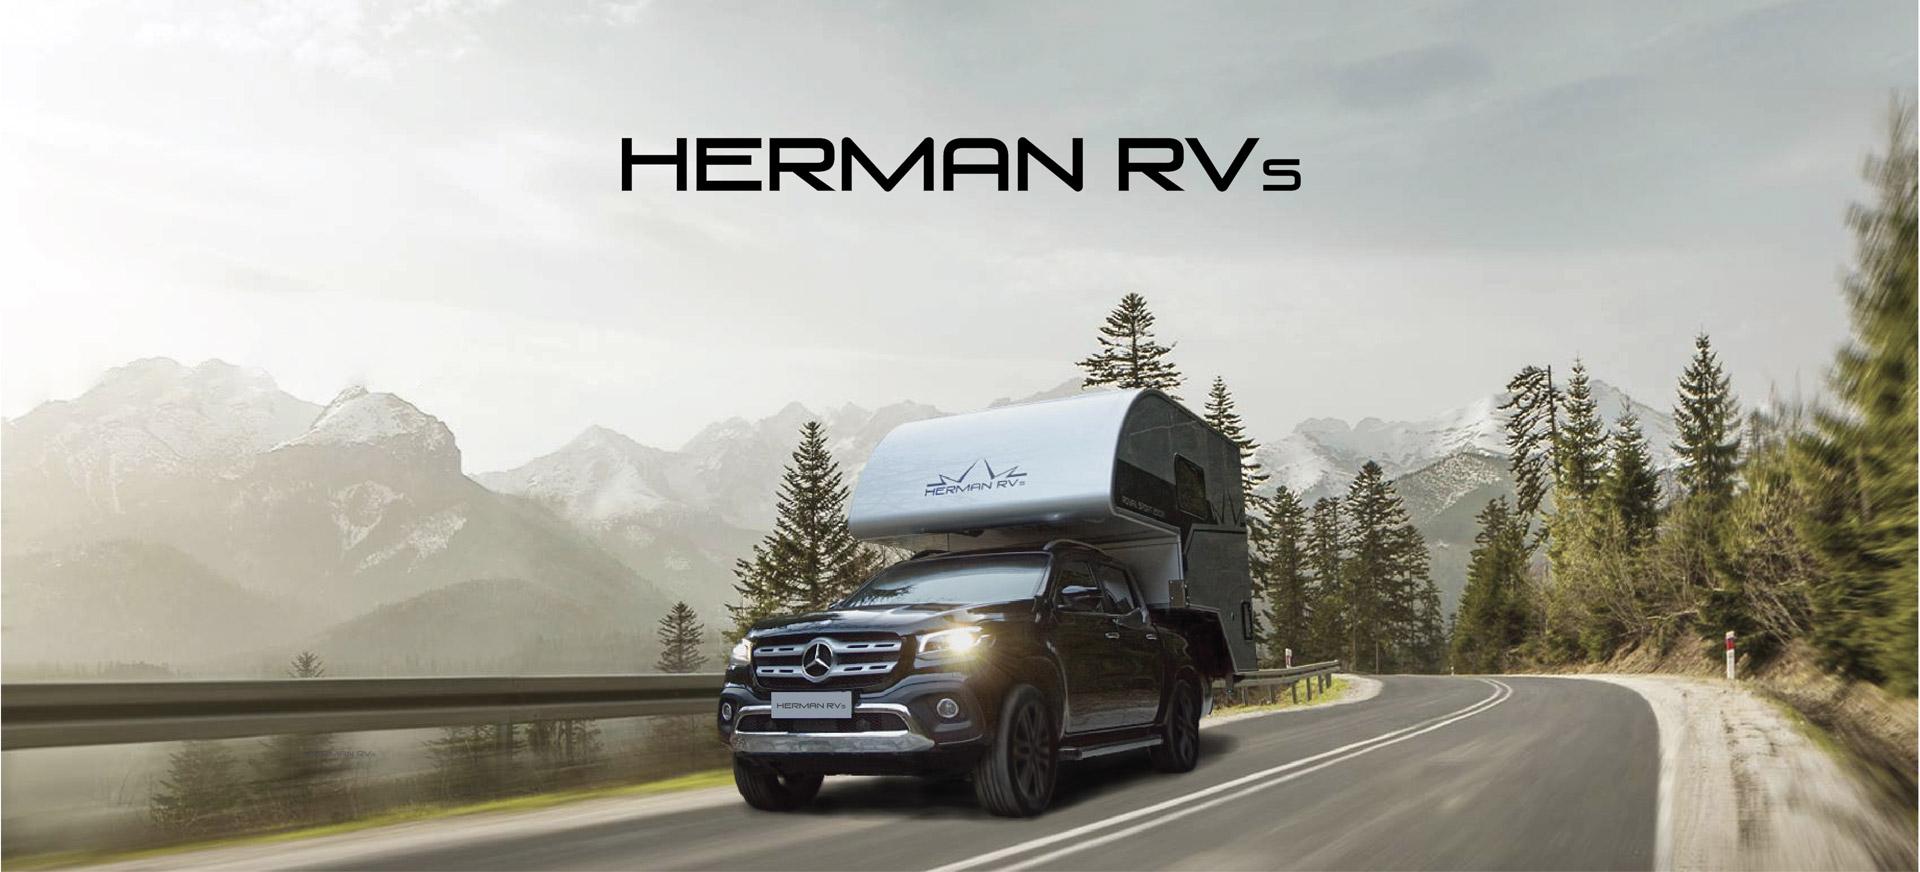 Herman RVs